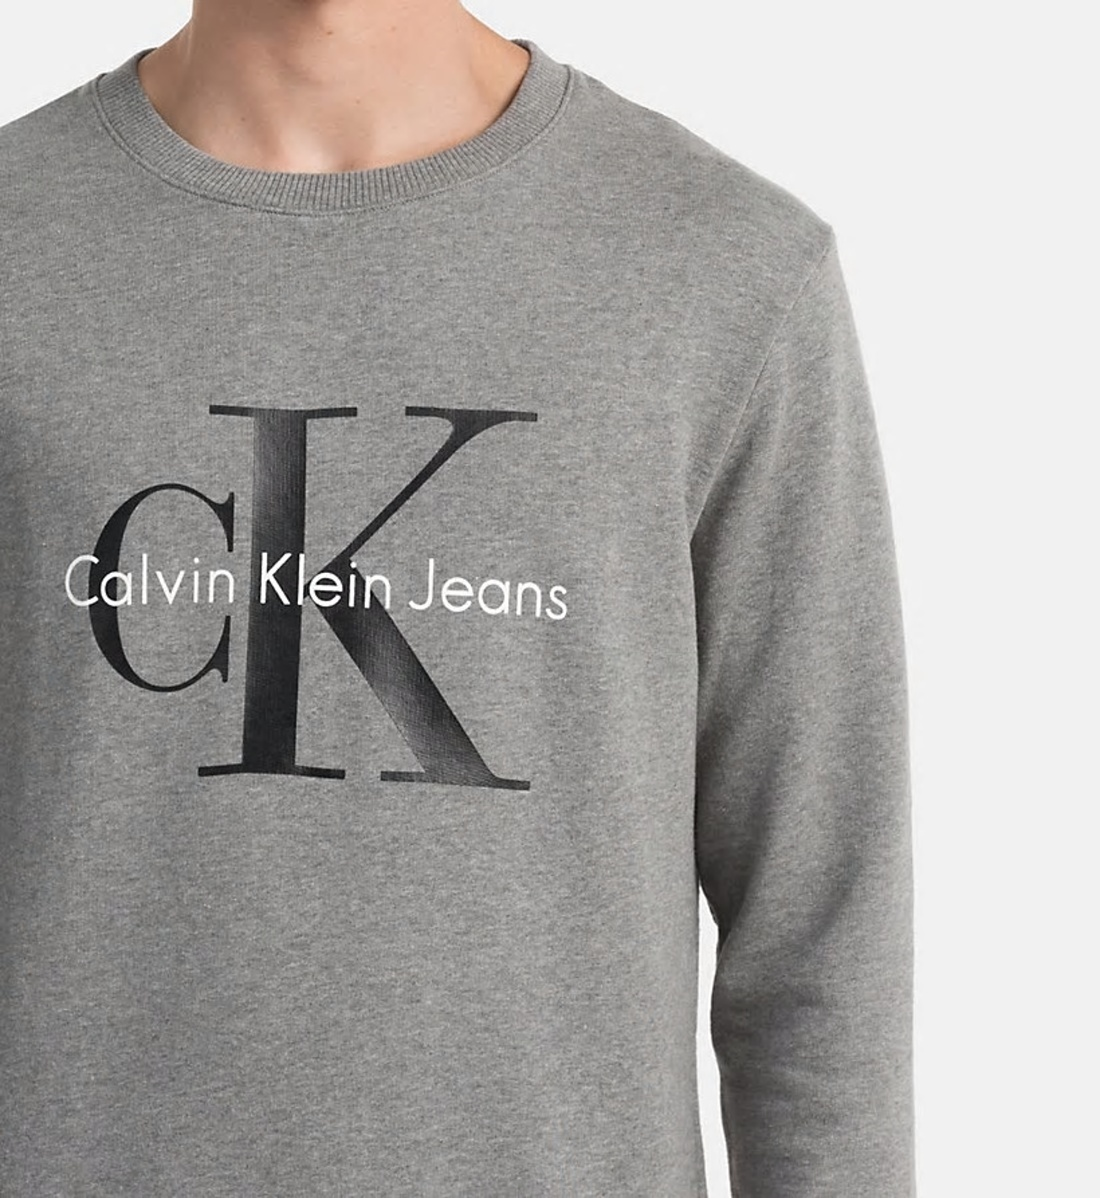 1e37d4329a Calvin Klein pánská šedá mikina - Mode.cz